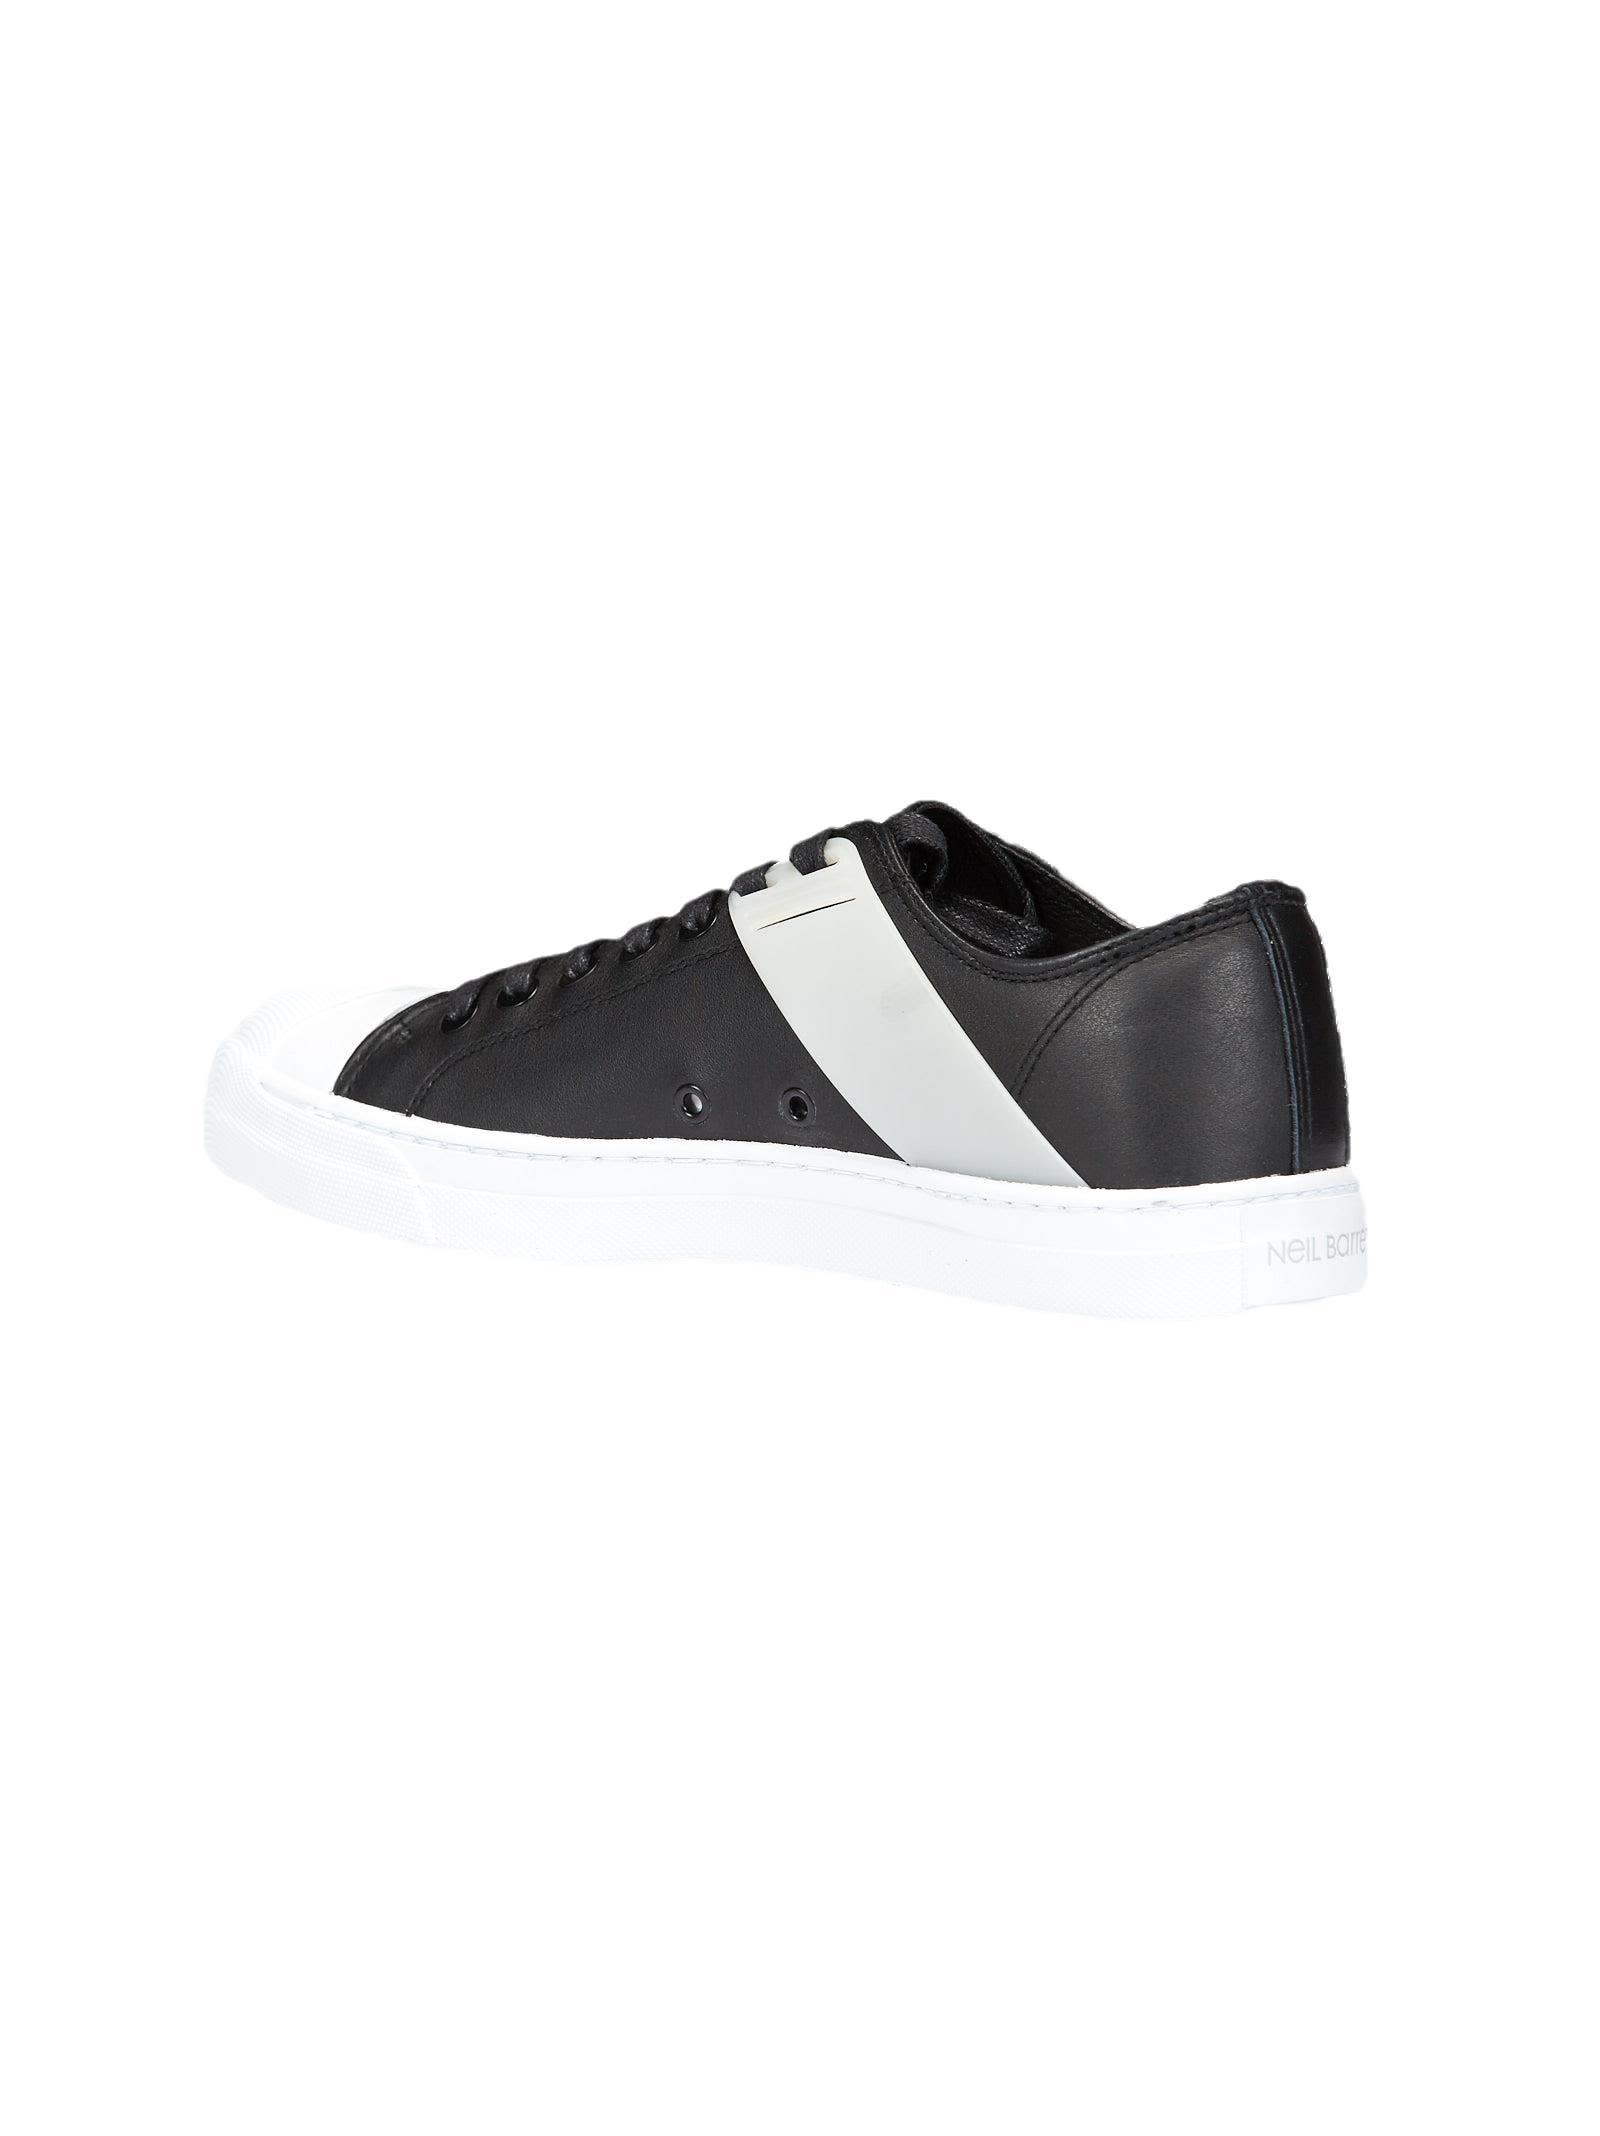 Gang sneakers - Black Neil Barrett D3VEag7a